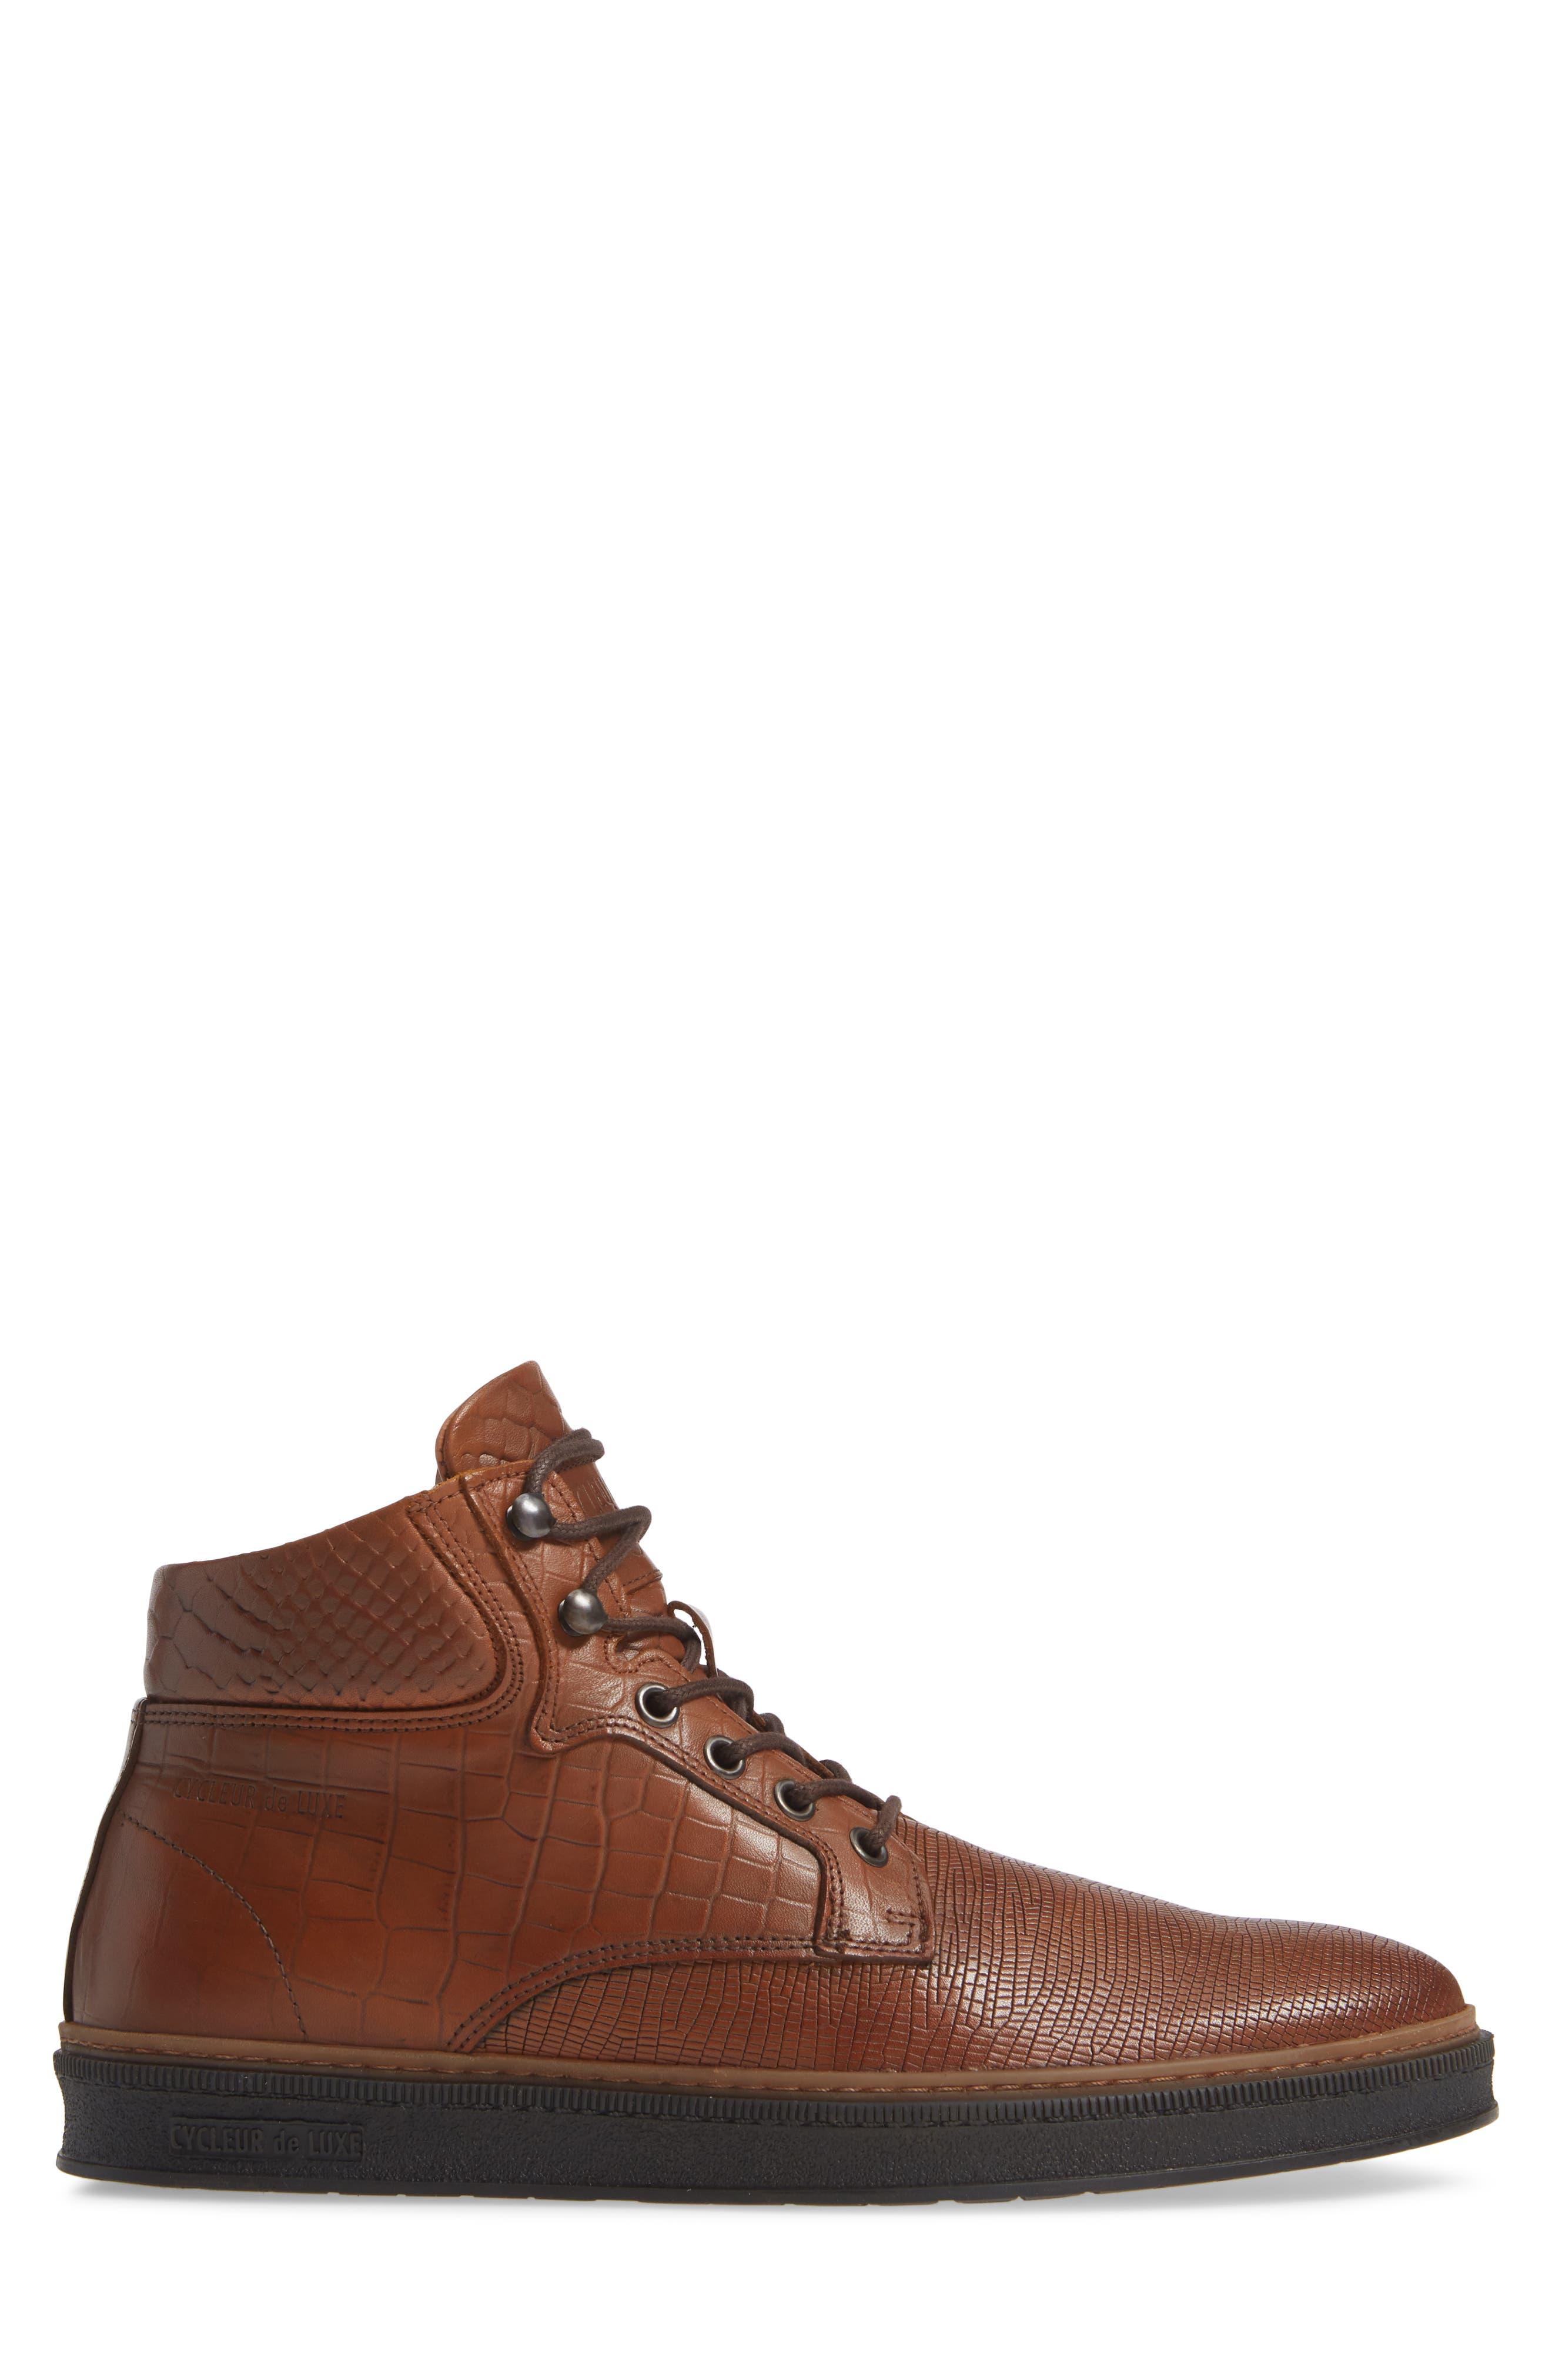 Lissabon Sneaker,                             Alternate thumbnail 3, color,                             DARK COGNAC